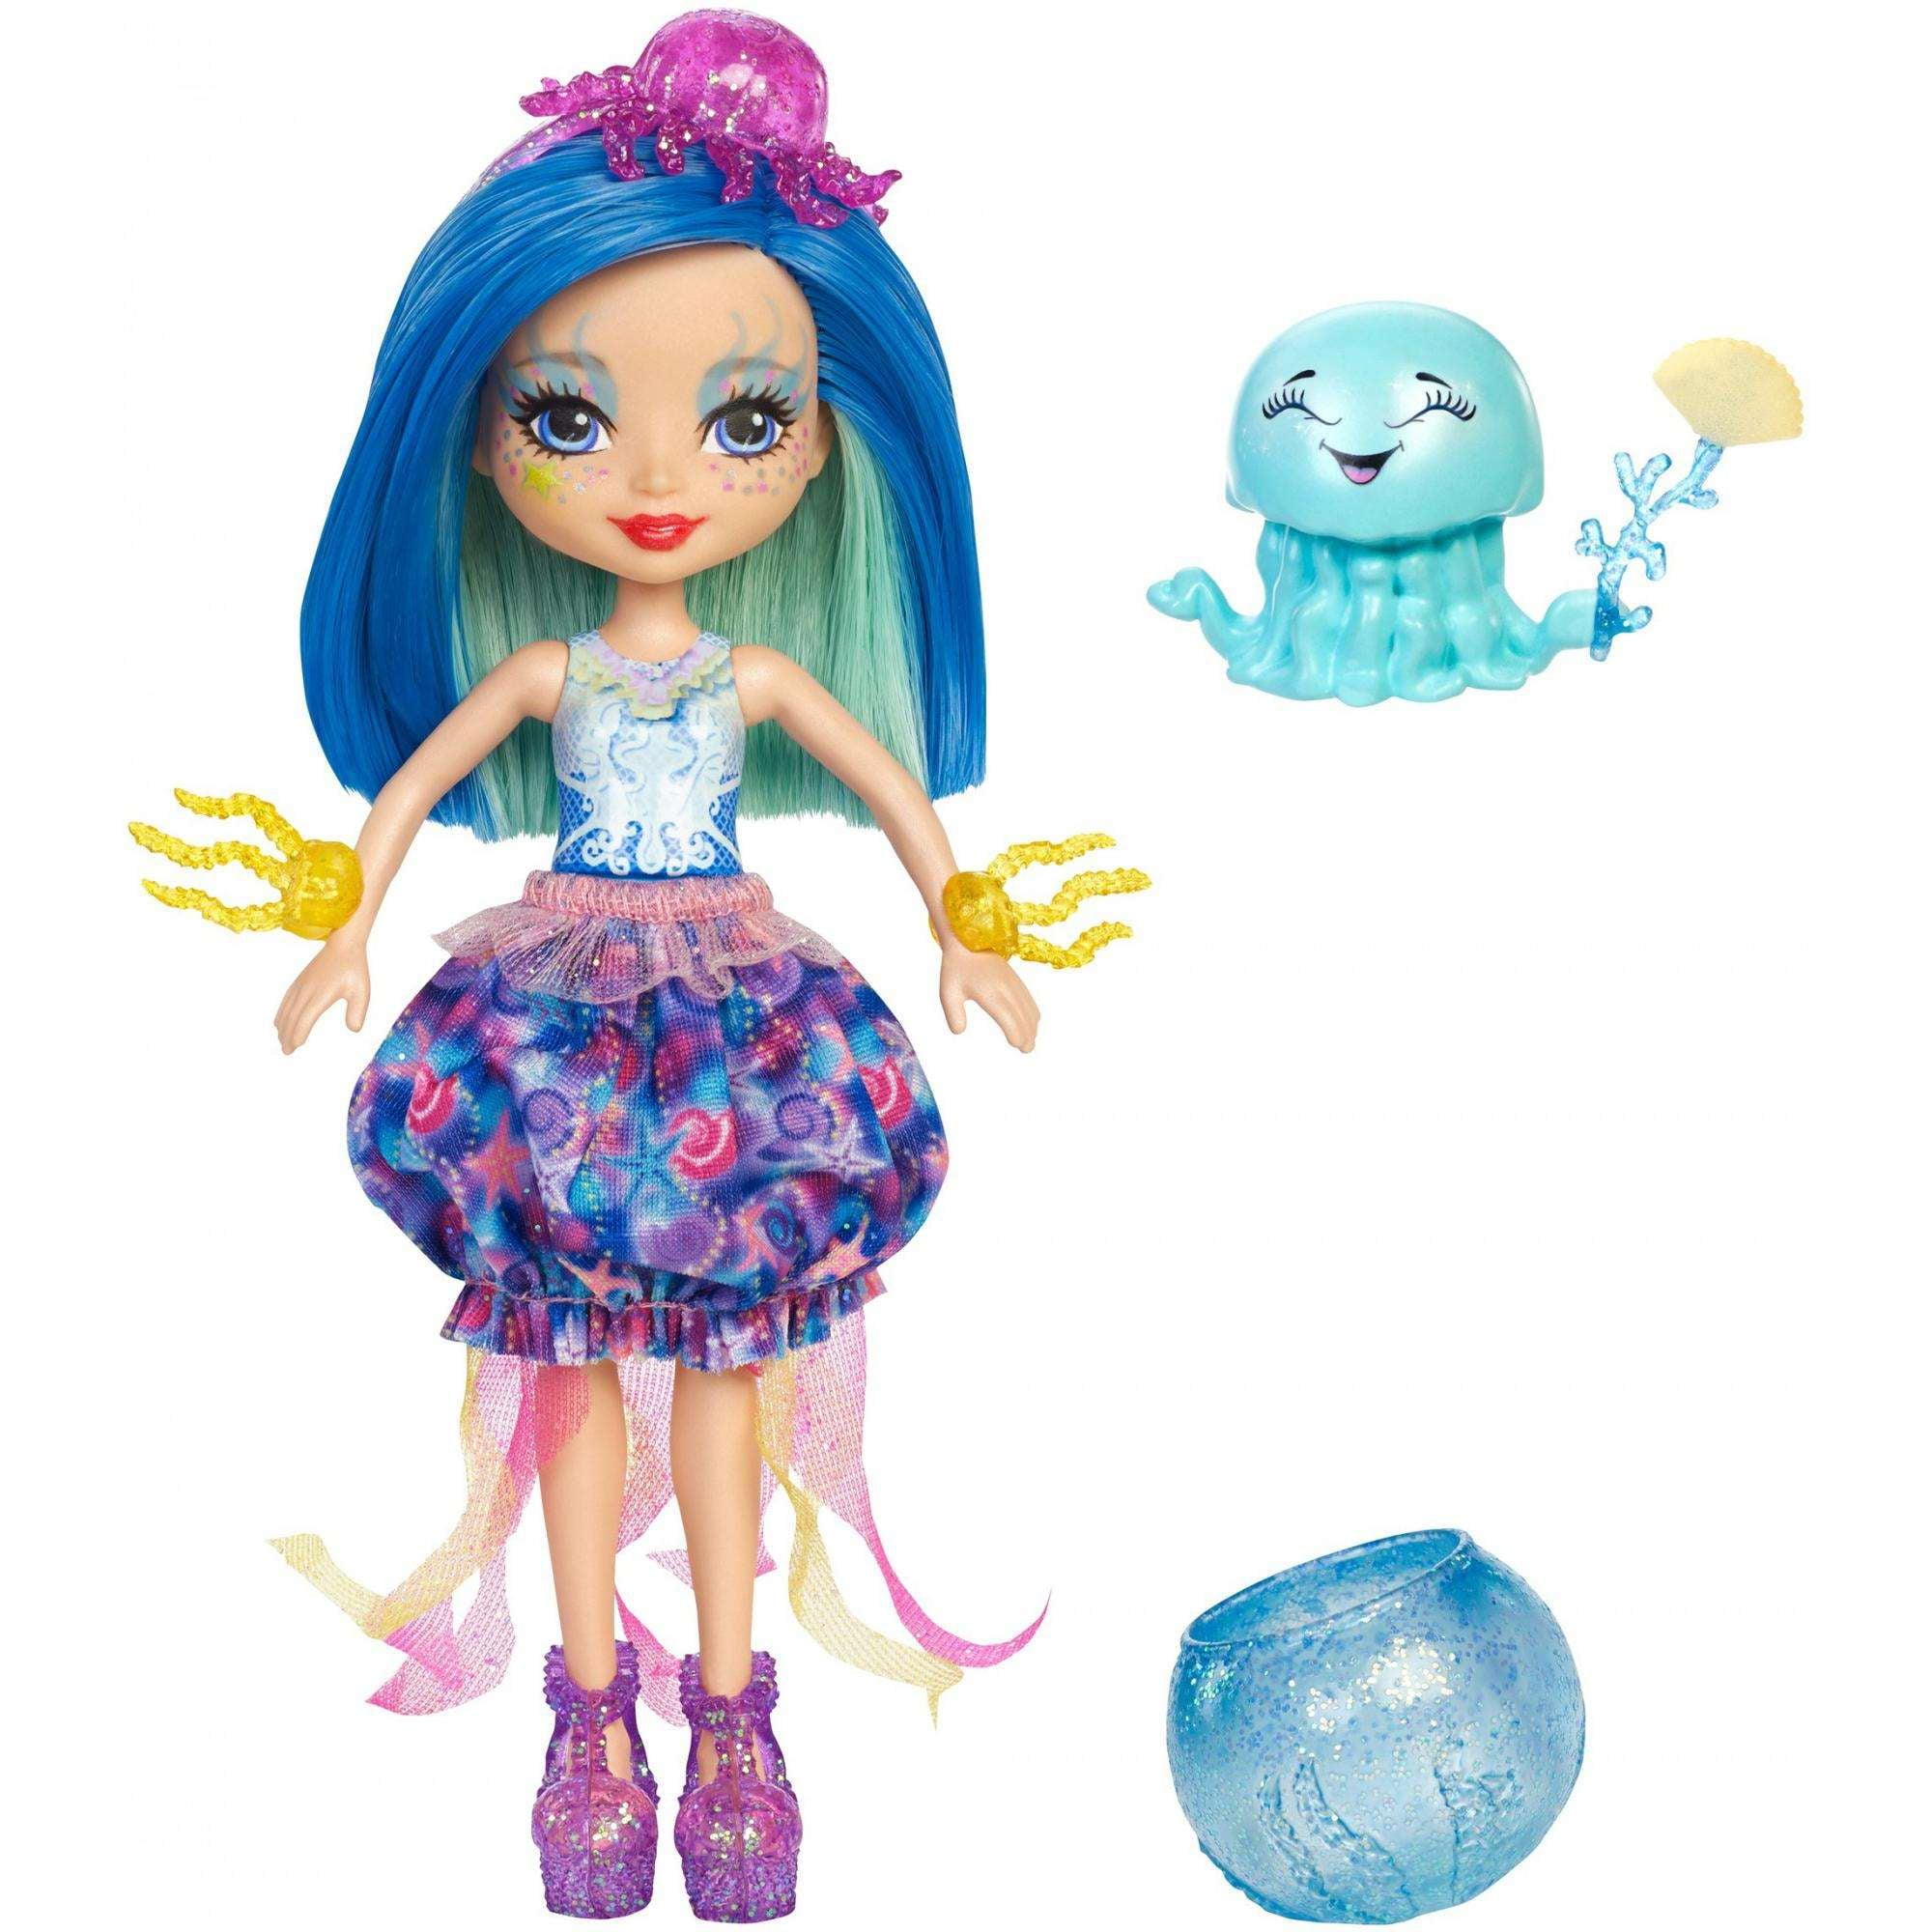 Enchantimals Jessa Jellyfish Dolls